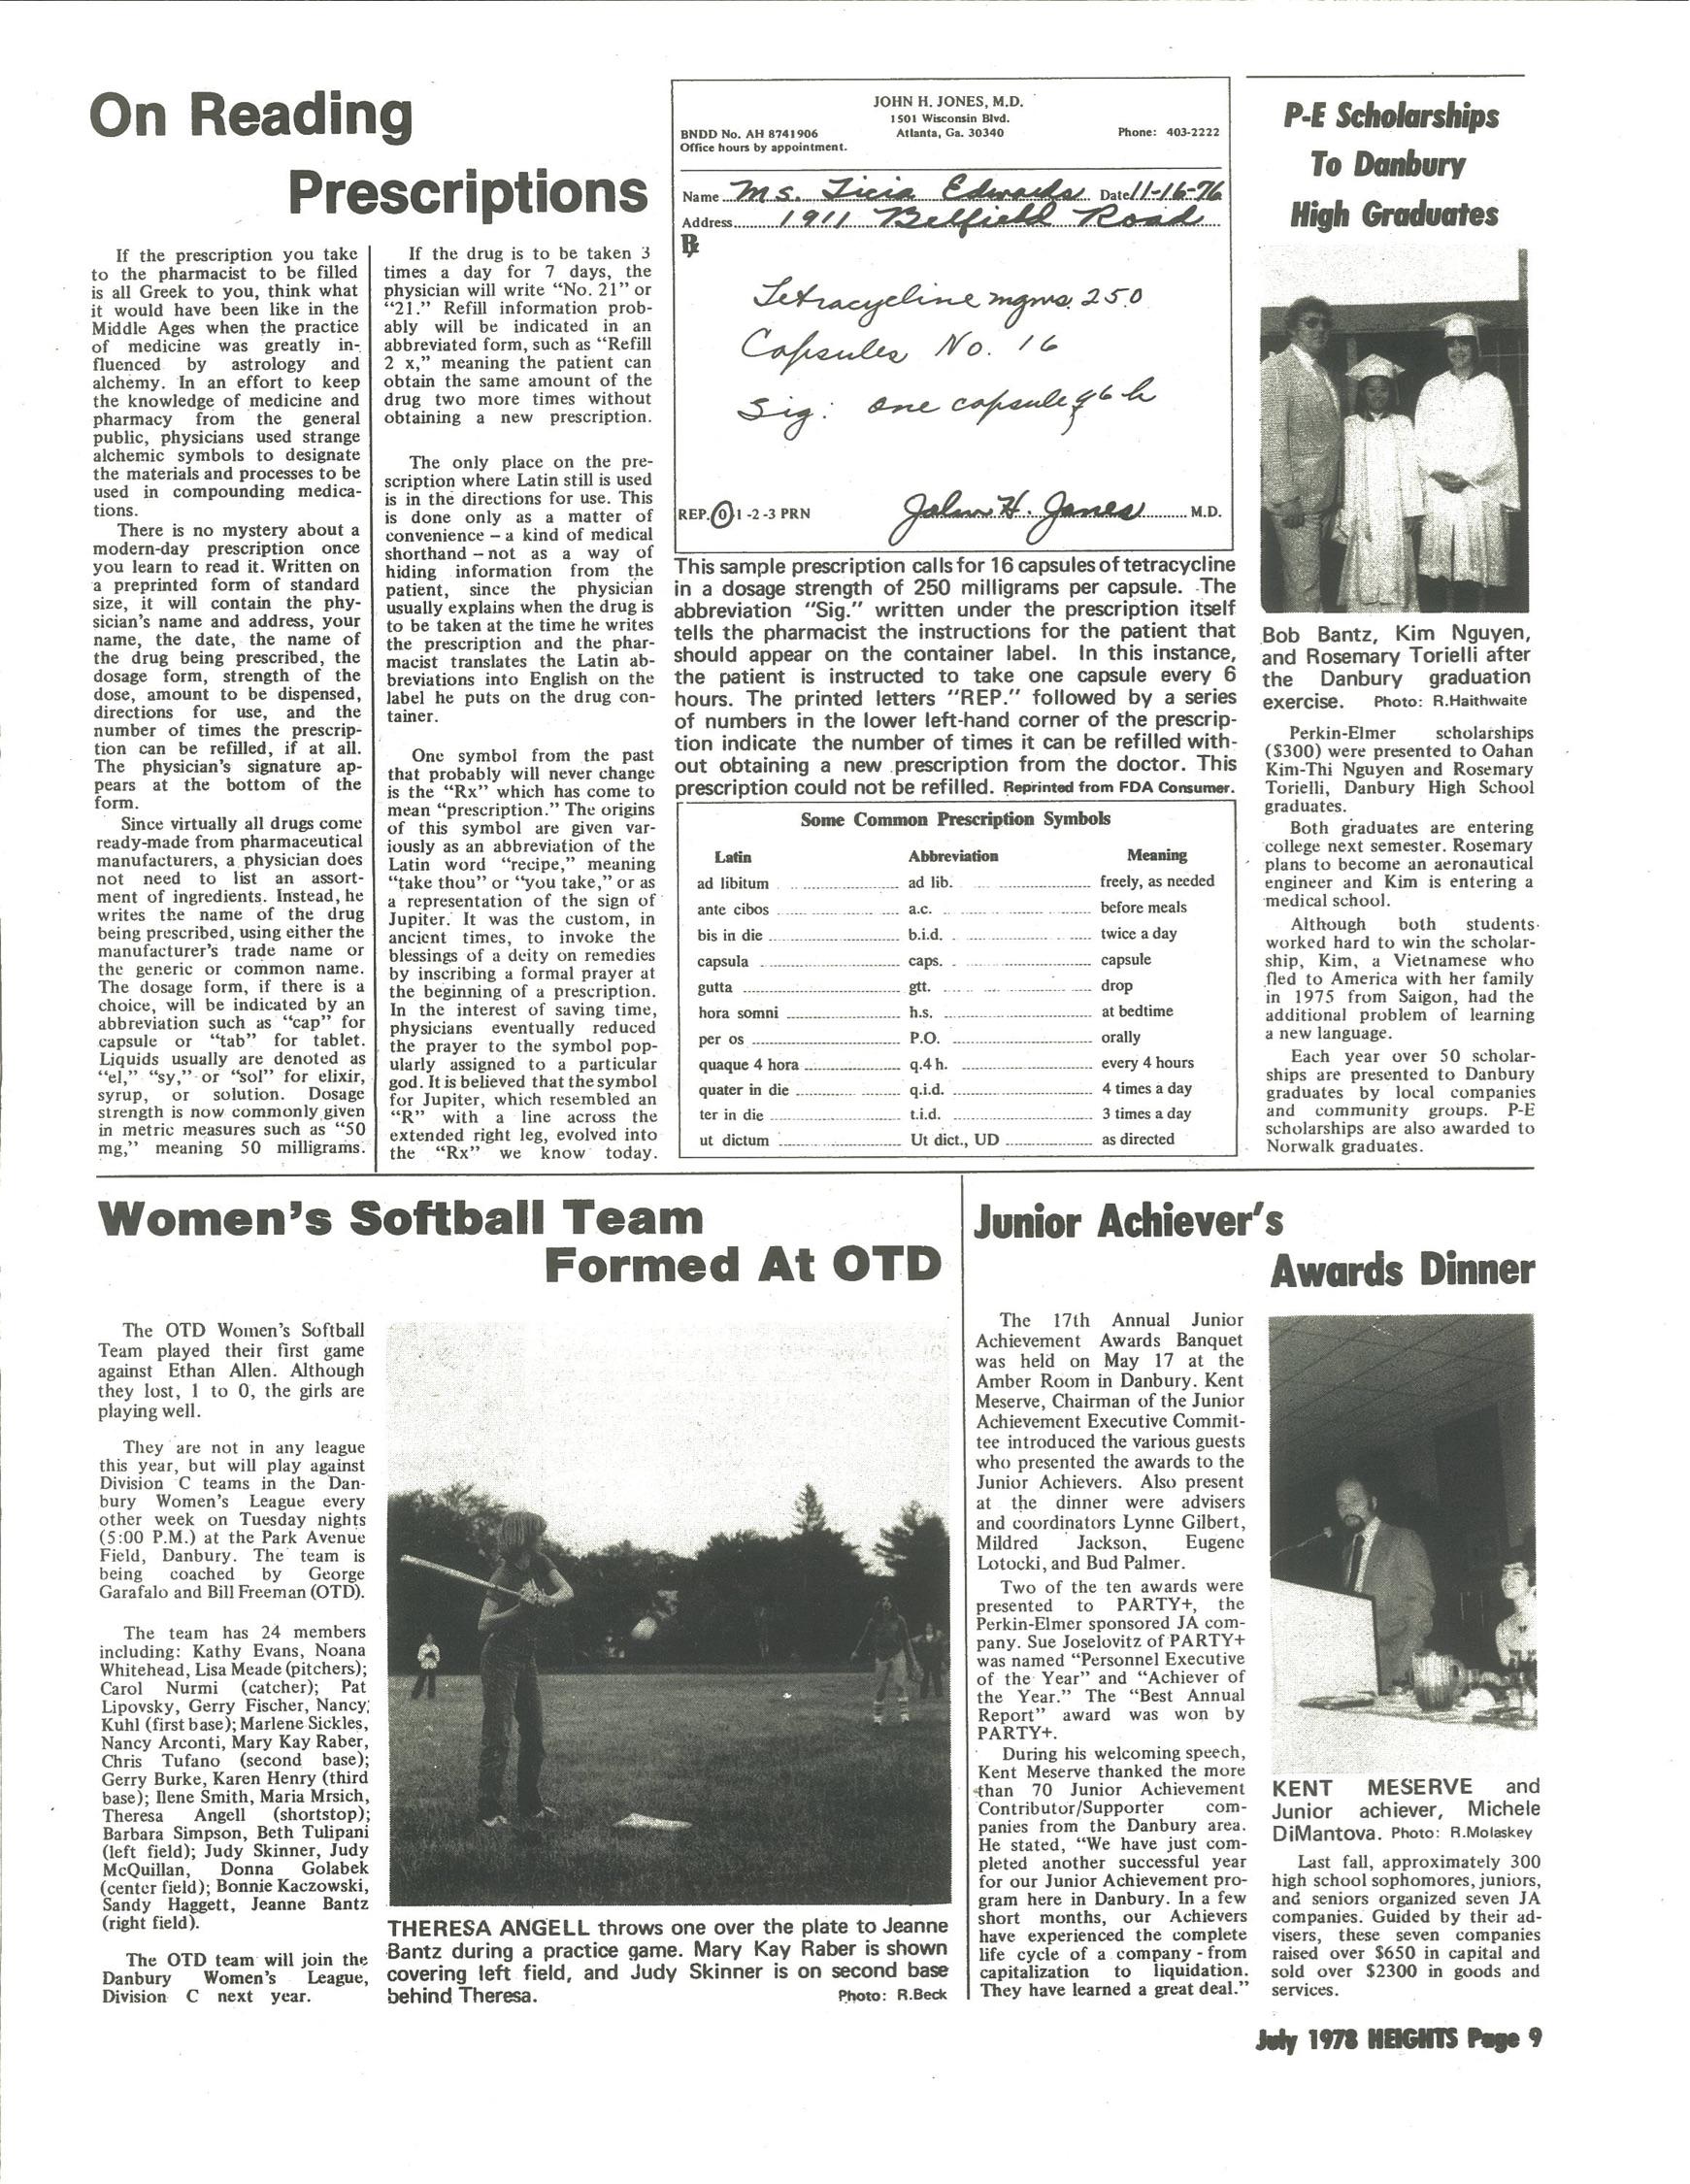 vol 11 num 3 page 9.jpg